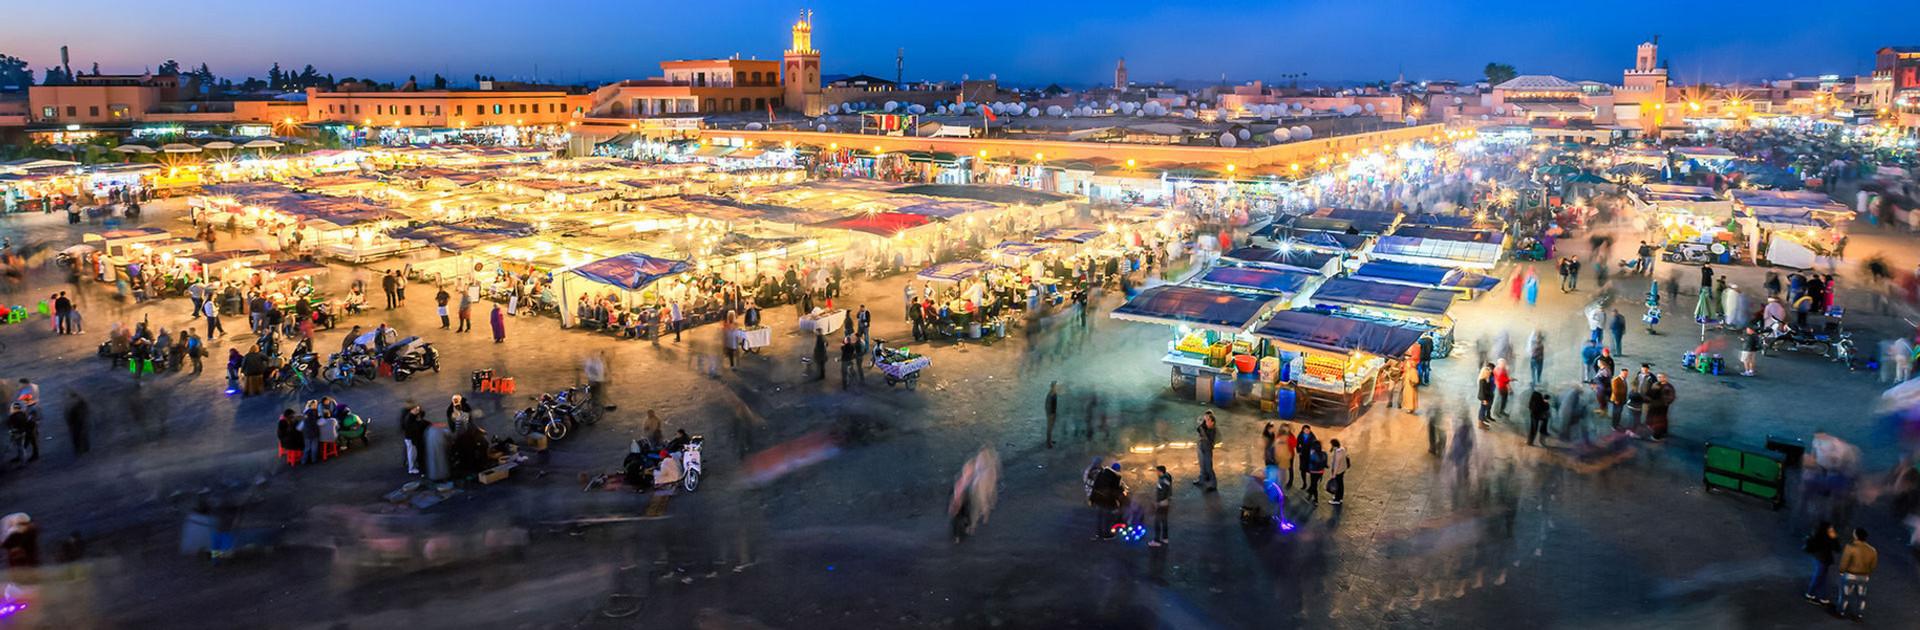 Marrakech- Jama-elfna